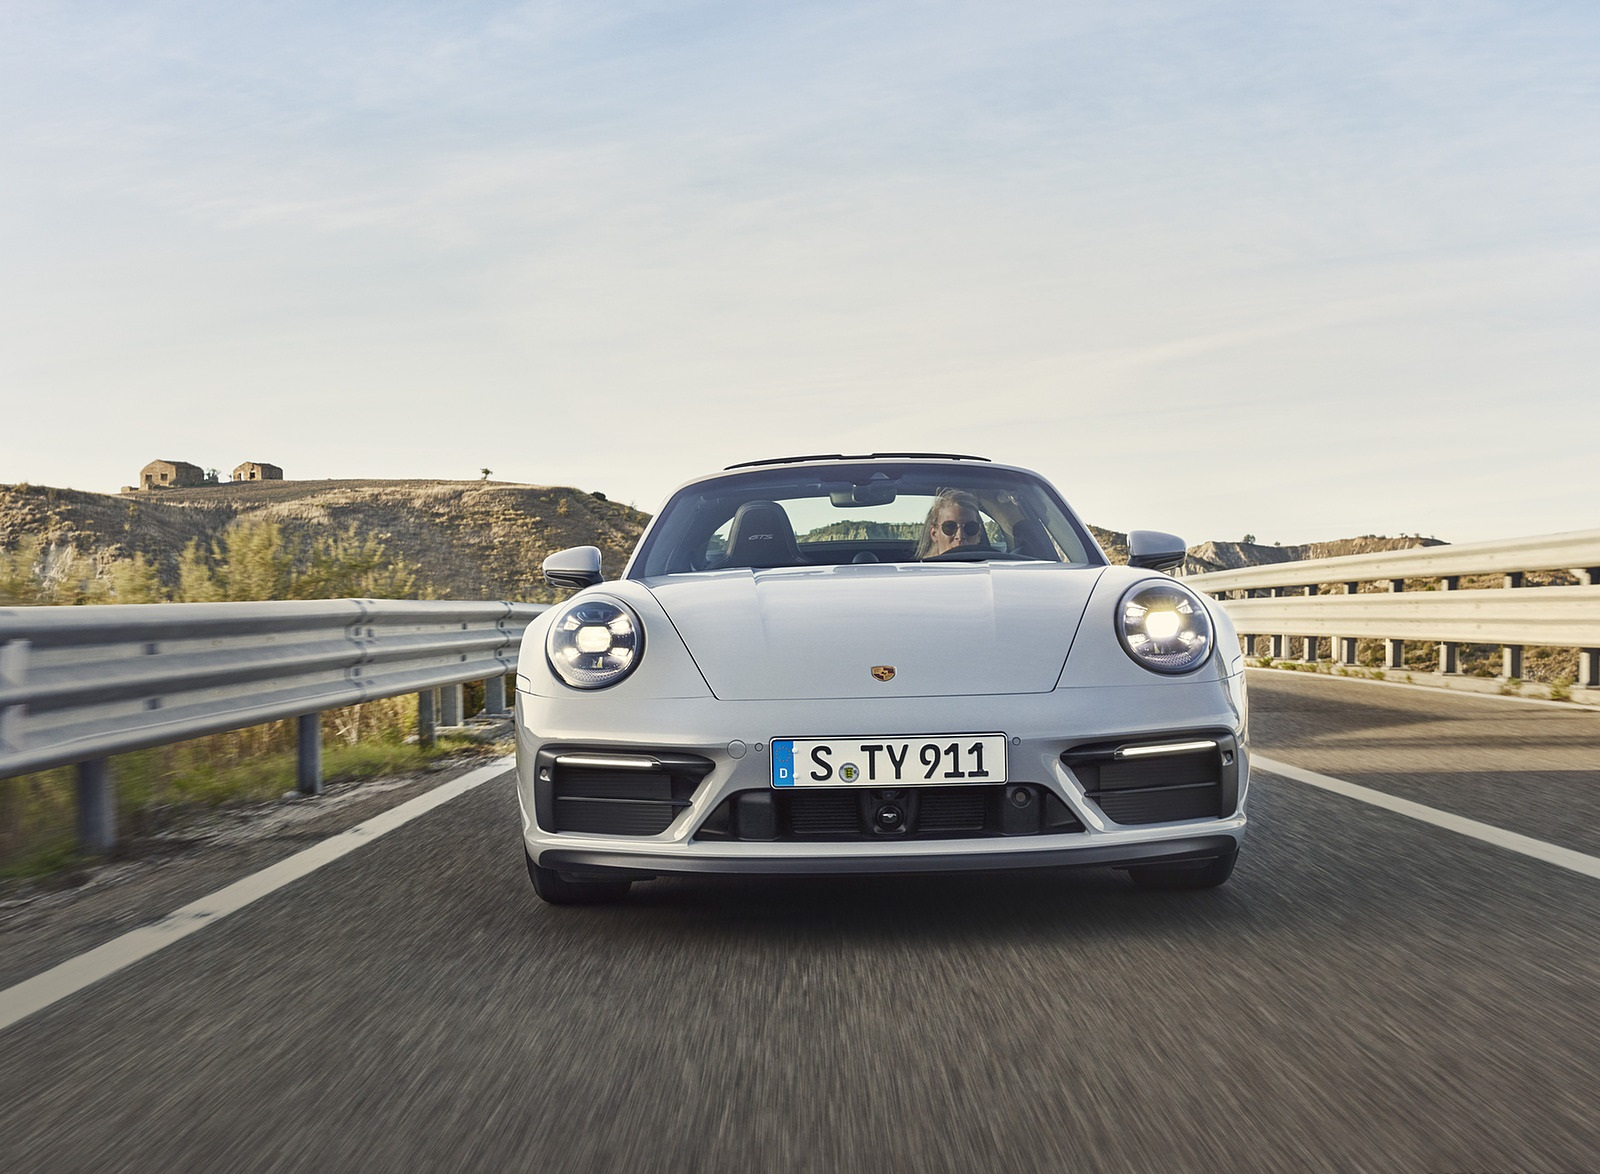 2022 Porsche 911 Targa 4 GTS Front Wallpapers (7)